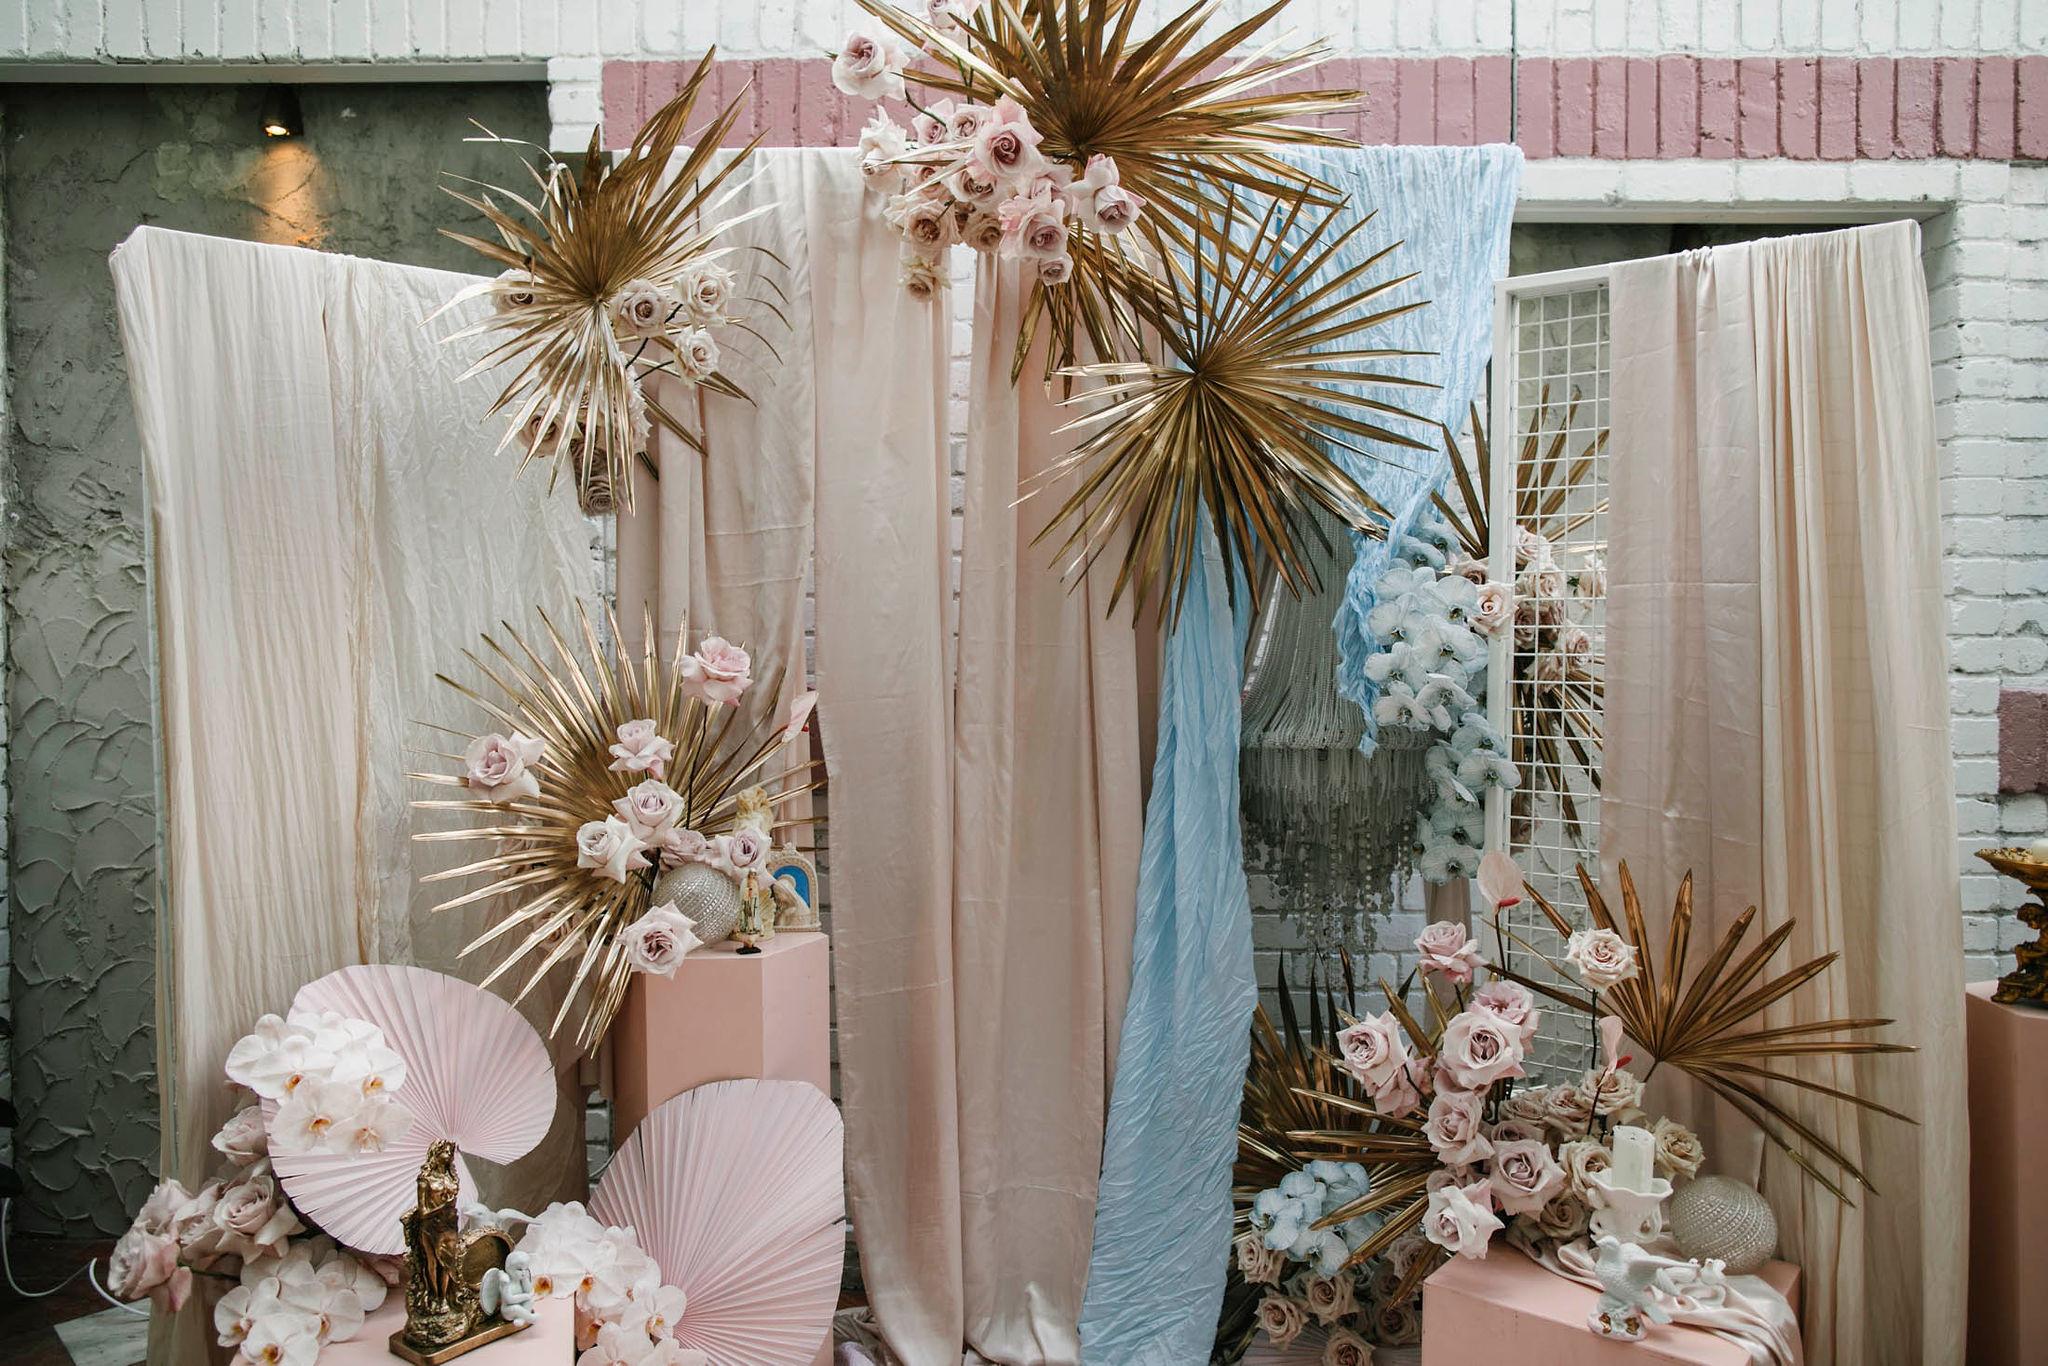 Lara + Cass Juliet's bedroom bohemian blooms vista